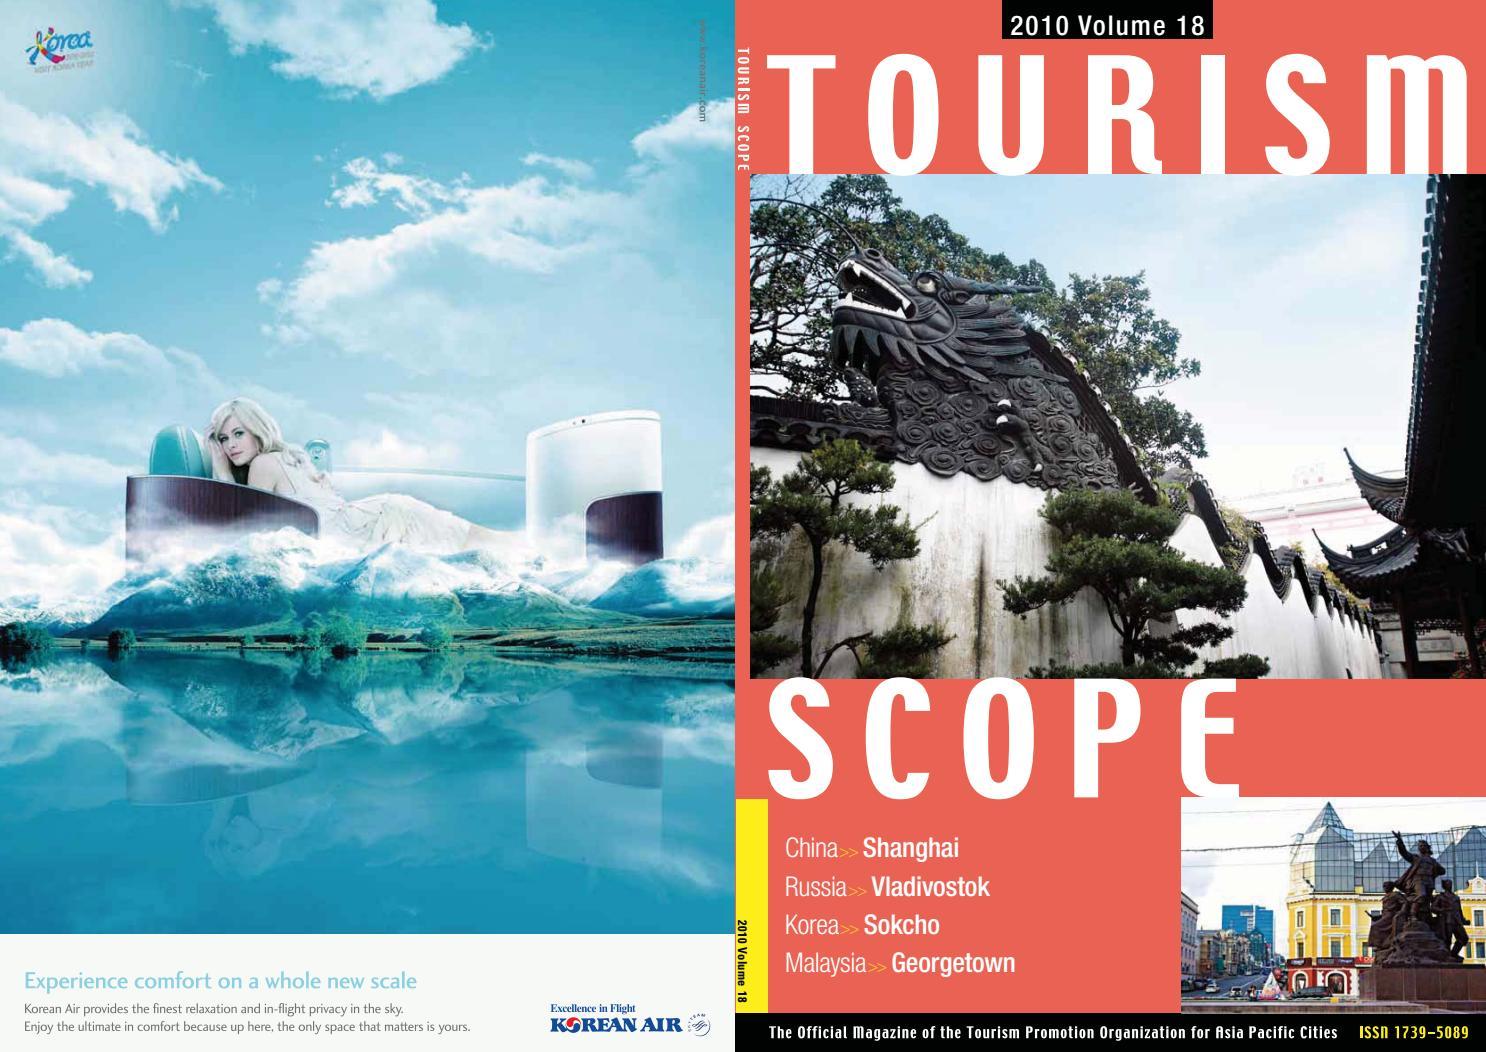 Tourism Scope Vol. 18_En by Tourism Scope - issuu